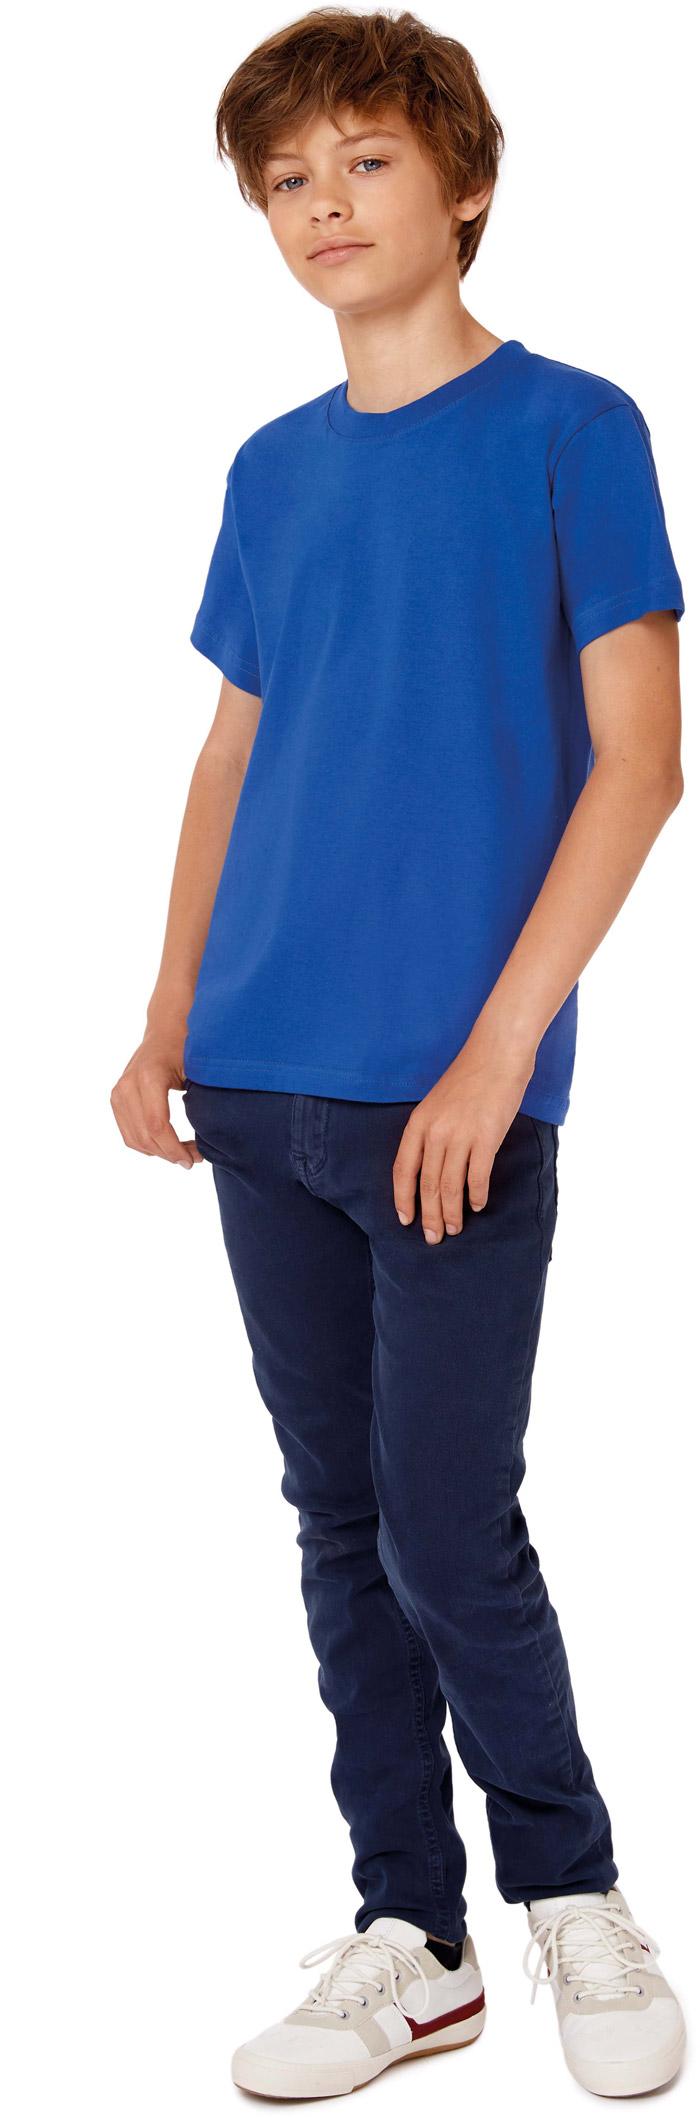 T-shirt enfant exact190 - CG189